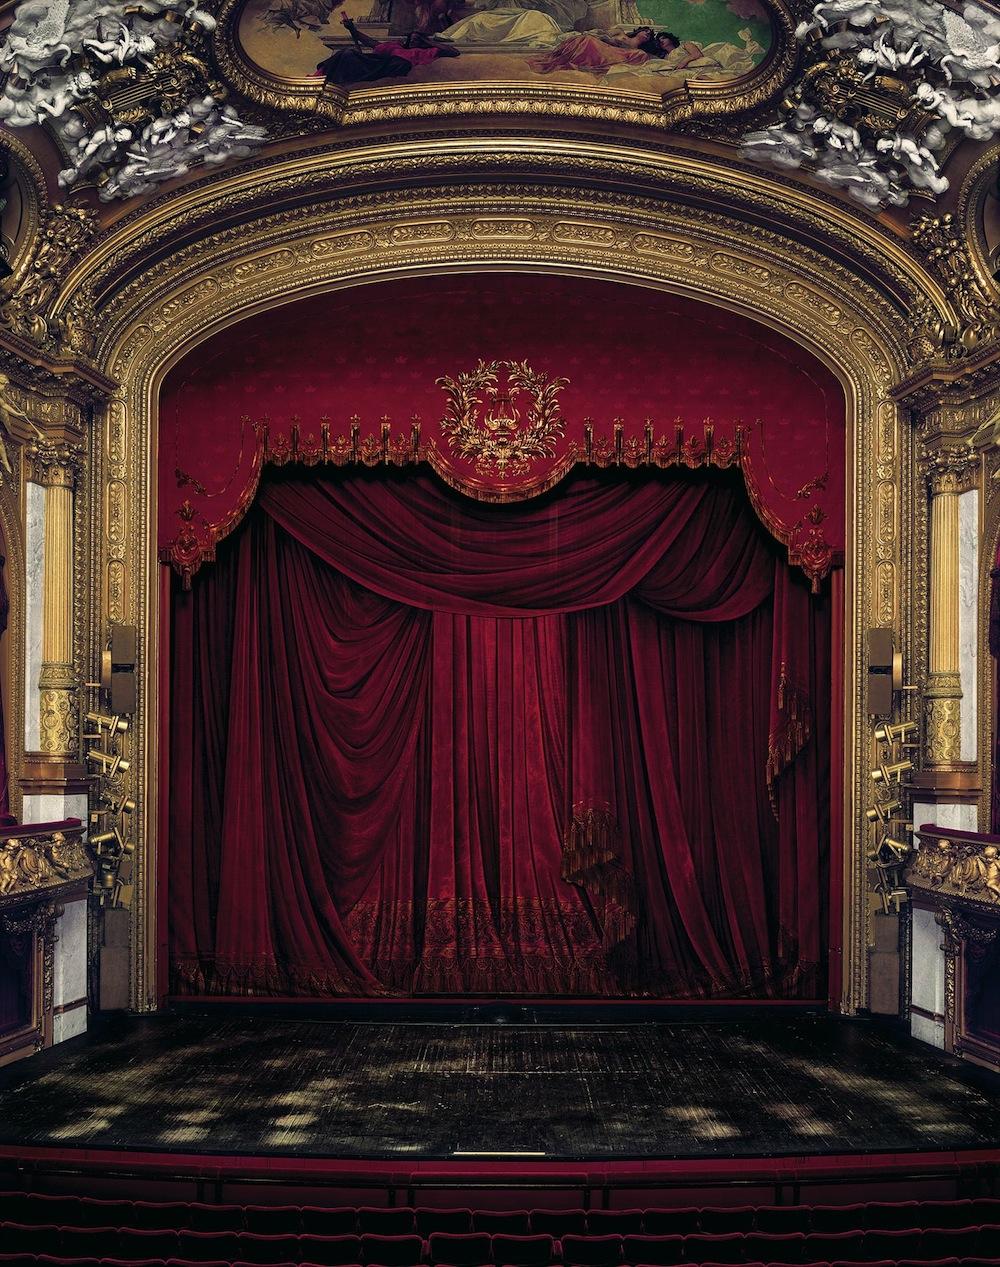 Curtain, Royal Swedish Opera, STOCKHOLM, SWEDEN, 2008